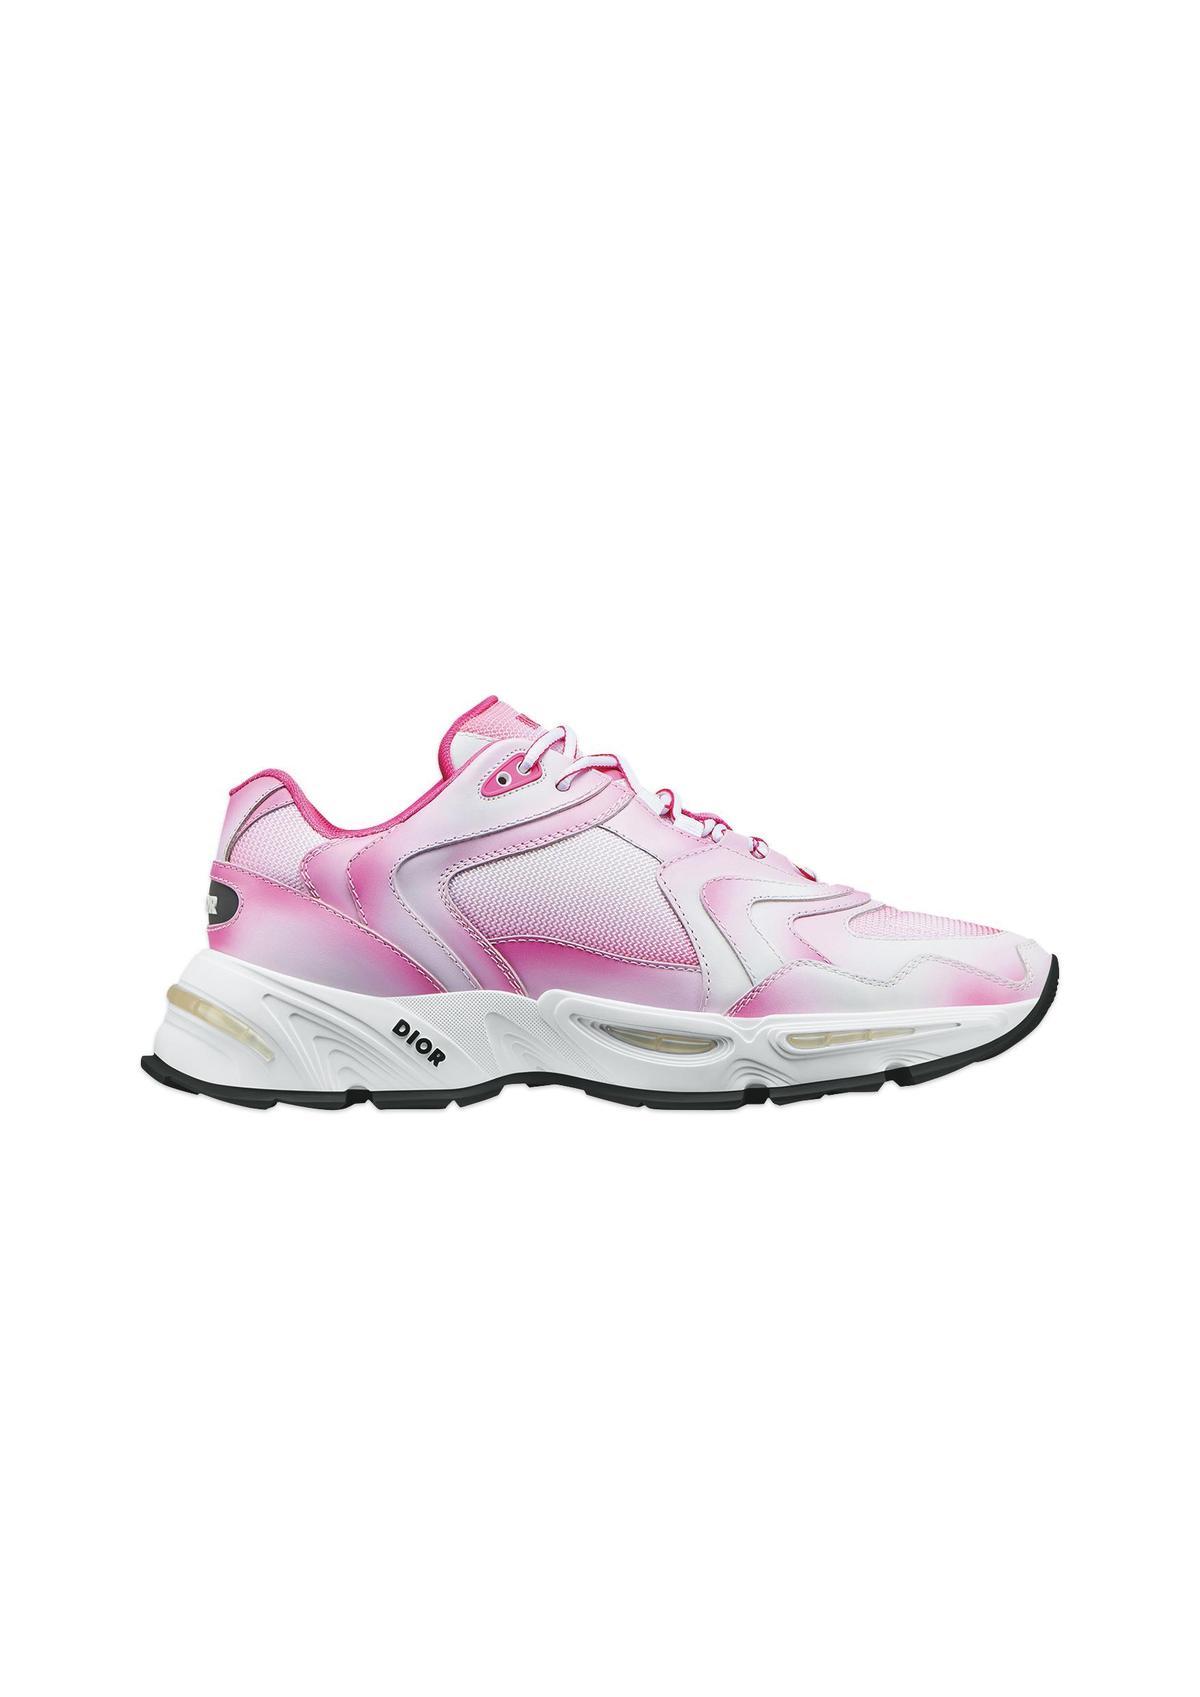 CD1粉色漸層網孔休閒鞋NT$40,000。(Dior提供)